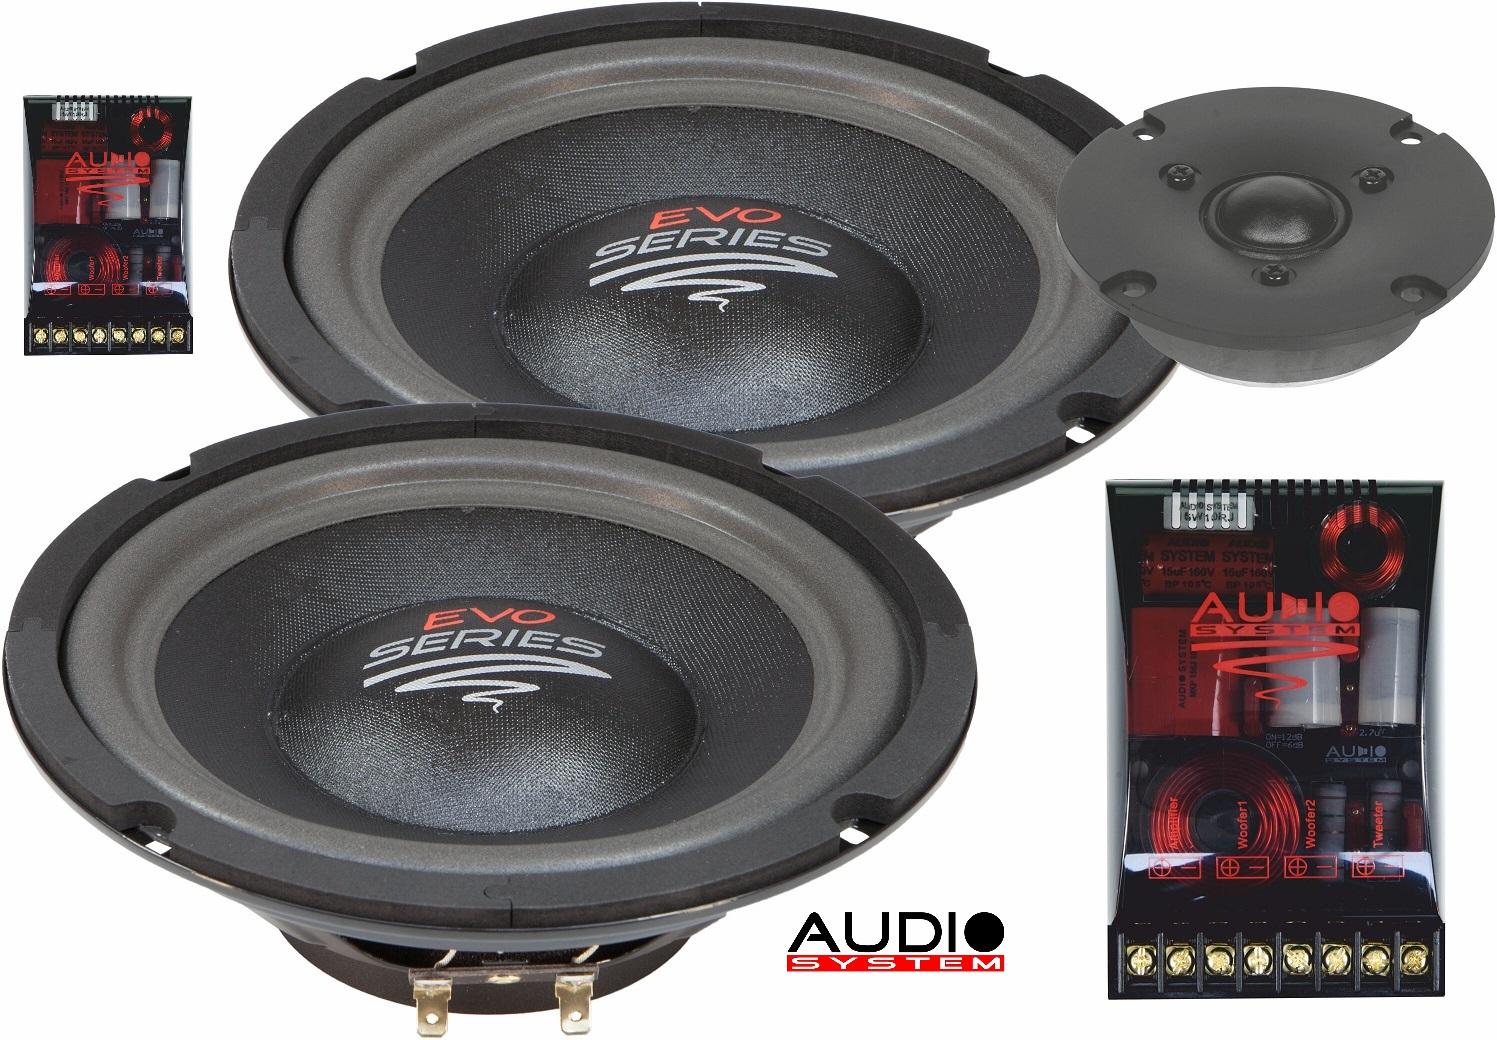 Audio System R 200 FL FREE AIR EVO R 2/20 FLAT FREE AIR flaches Compo System Lautsprecher